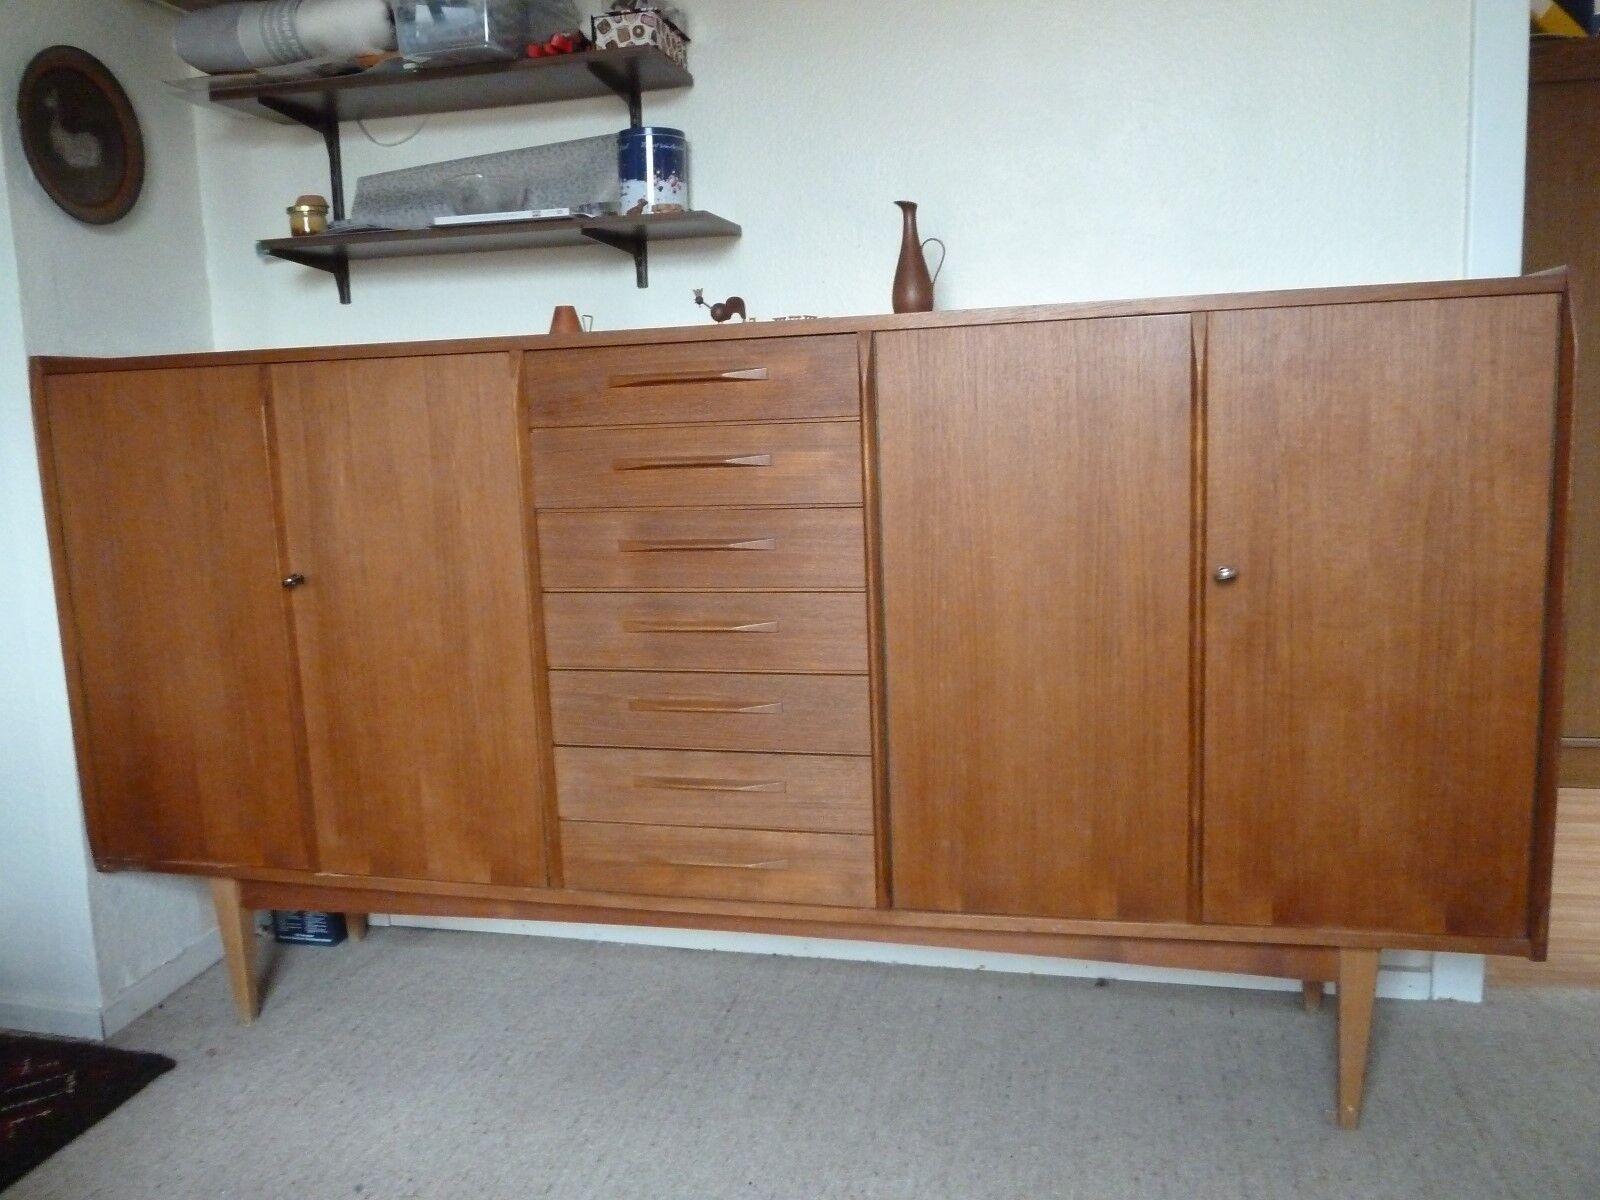 Vintage Sideboard Gunstig Retro Kommode Wei Beautiful Finest Full